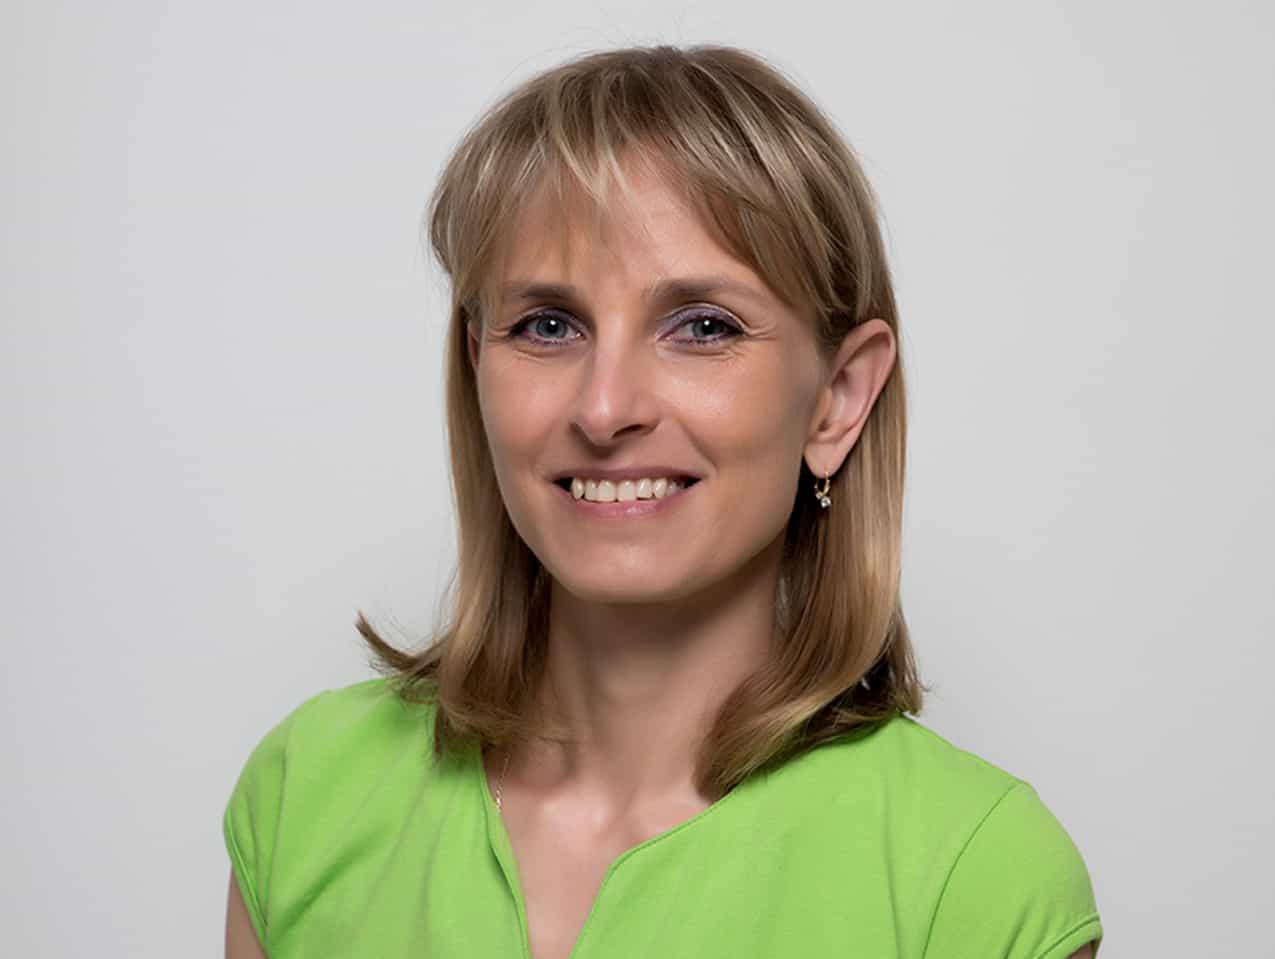 MUDr. Alena Filkova